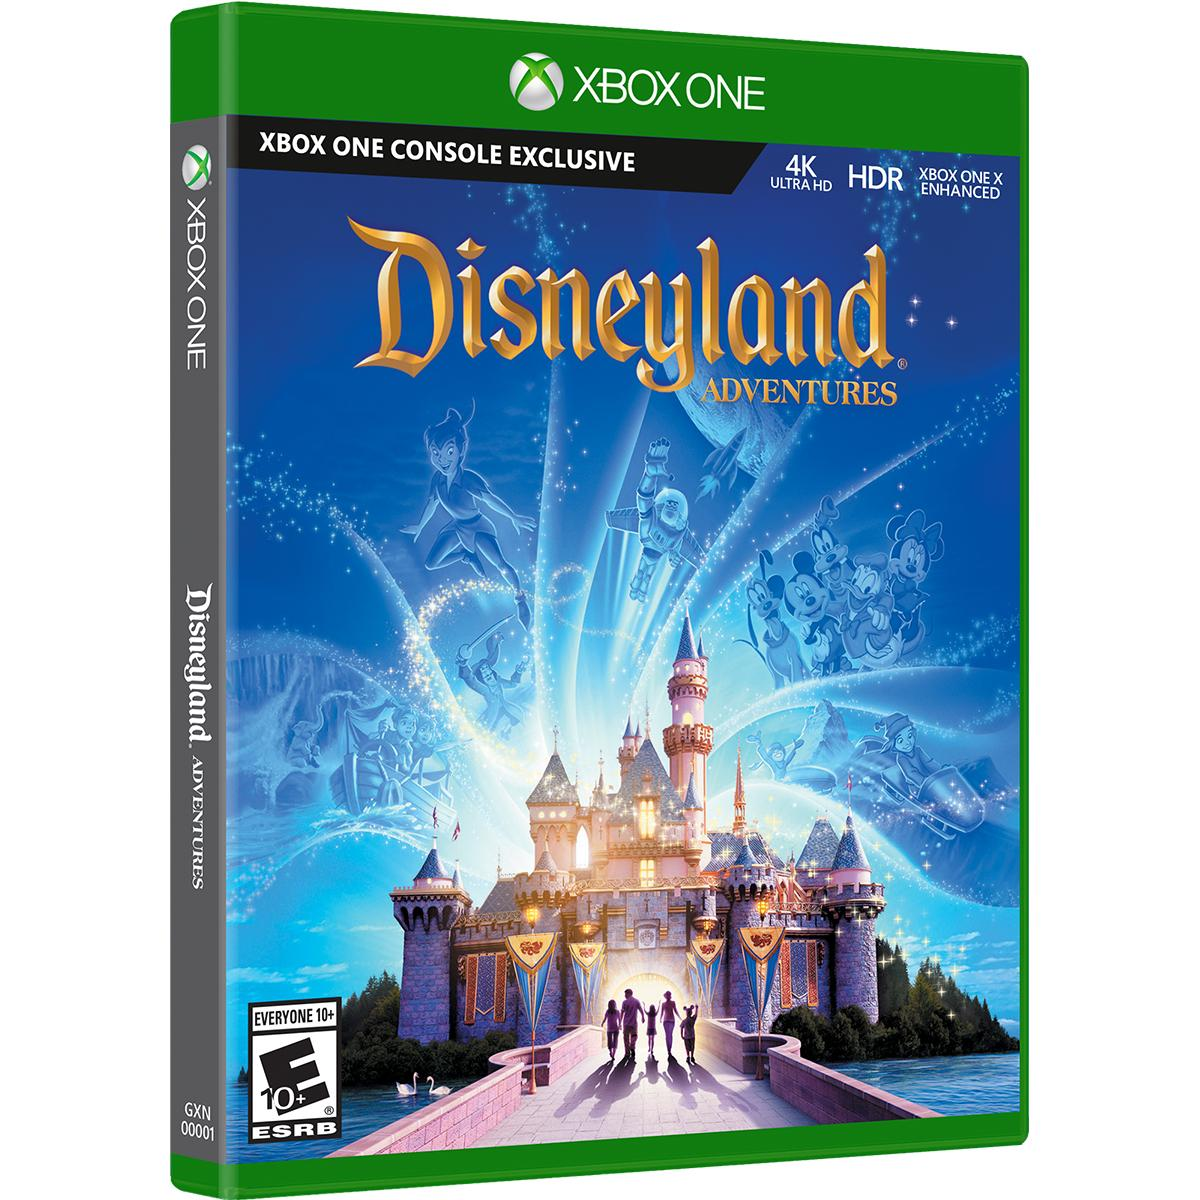 [Xbox GAMES] Disneyland Adventures